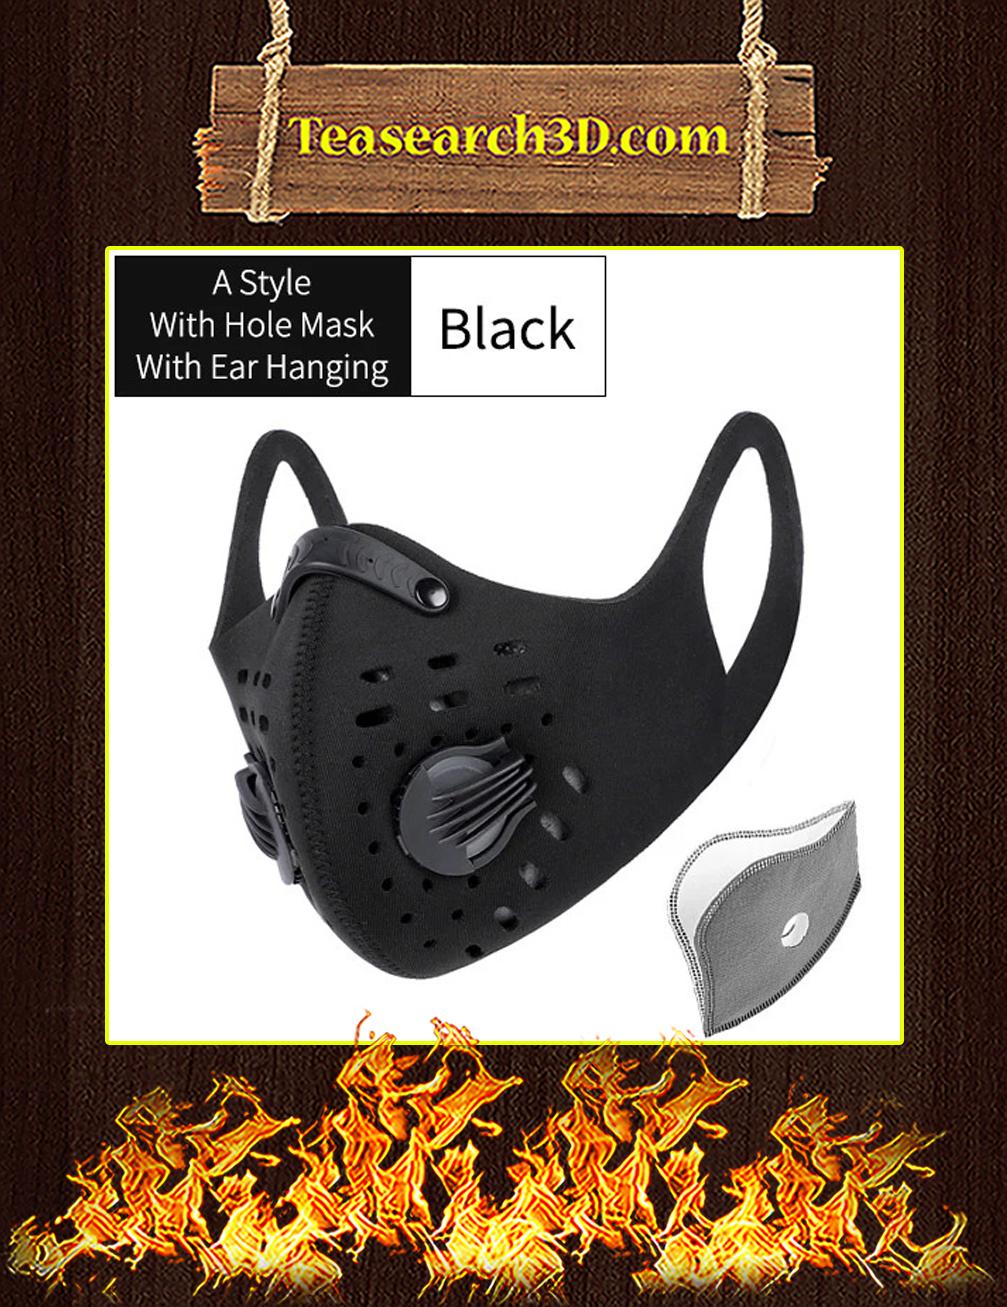 Black Camo Filter Activated Carbon Pm 2.5 Fm Face Mask